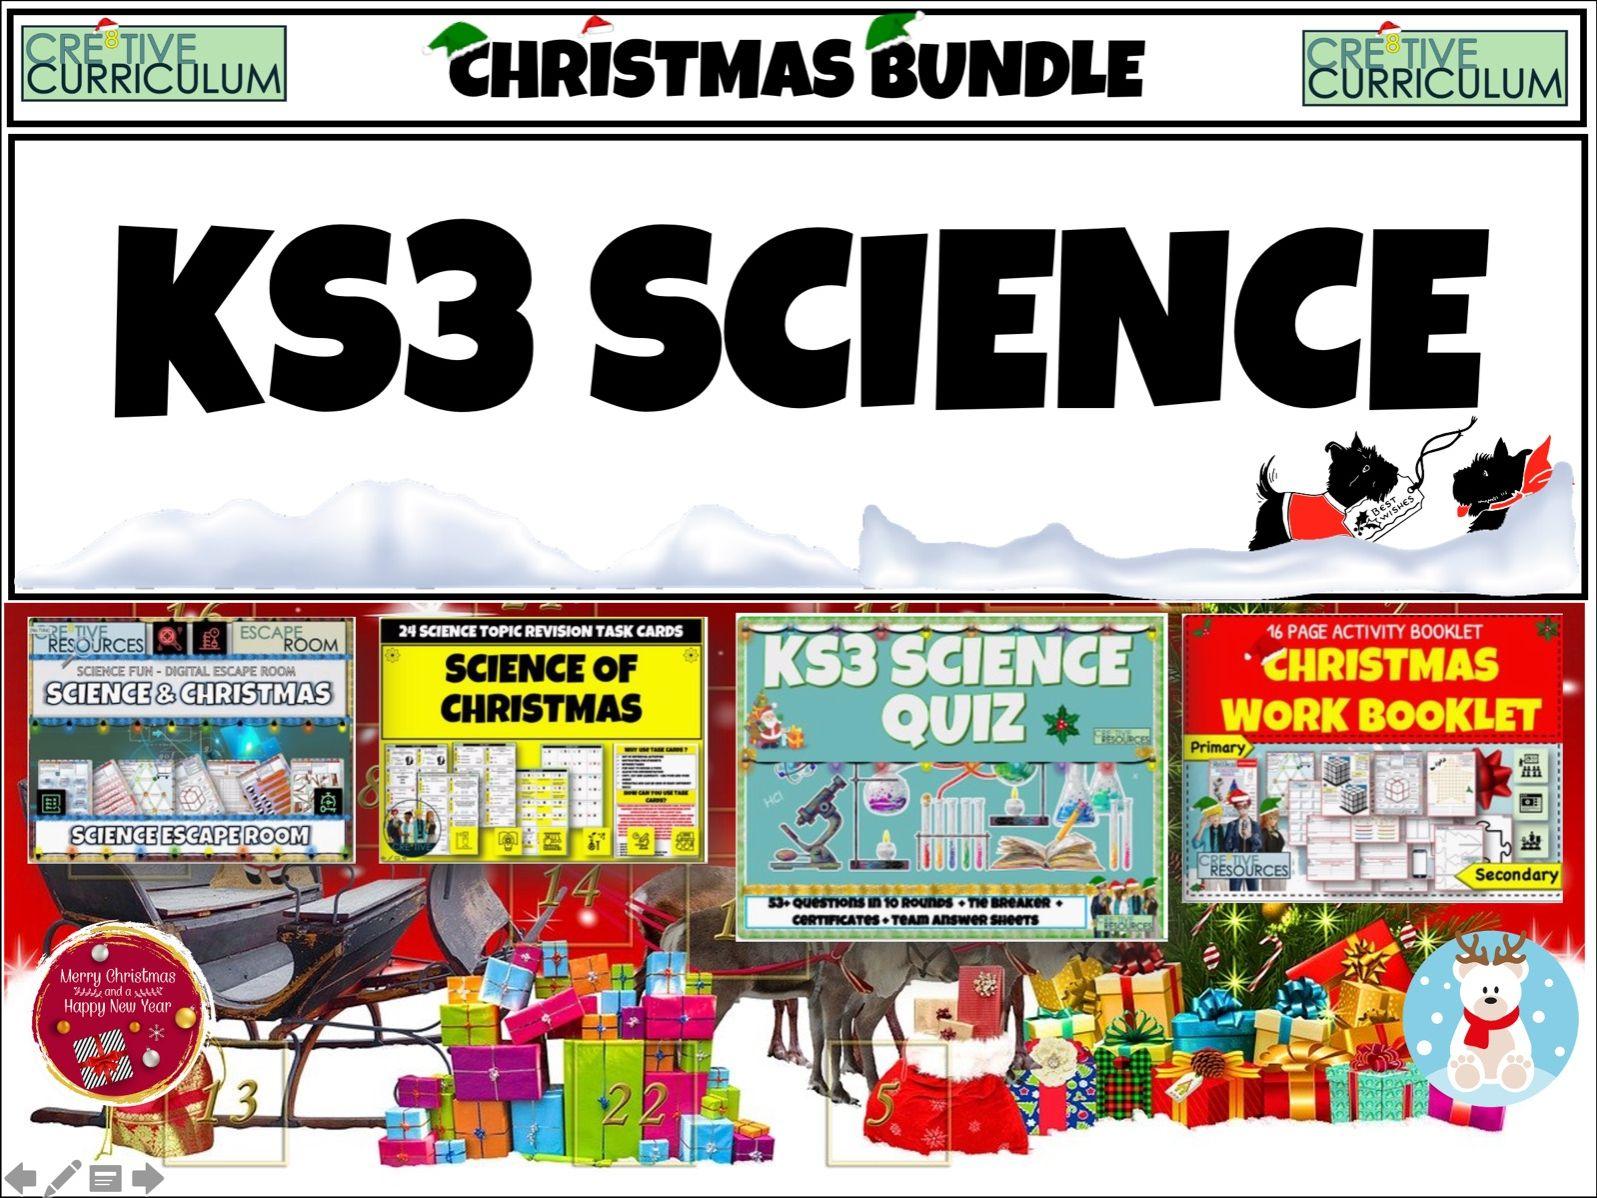 KS3 Science Christmas Bundle